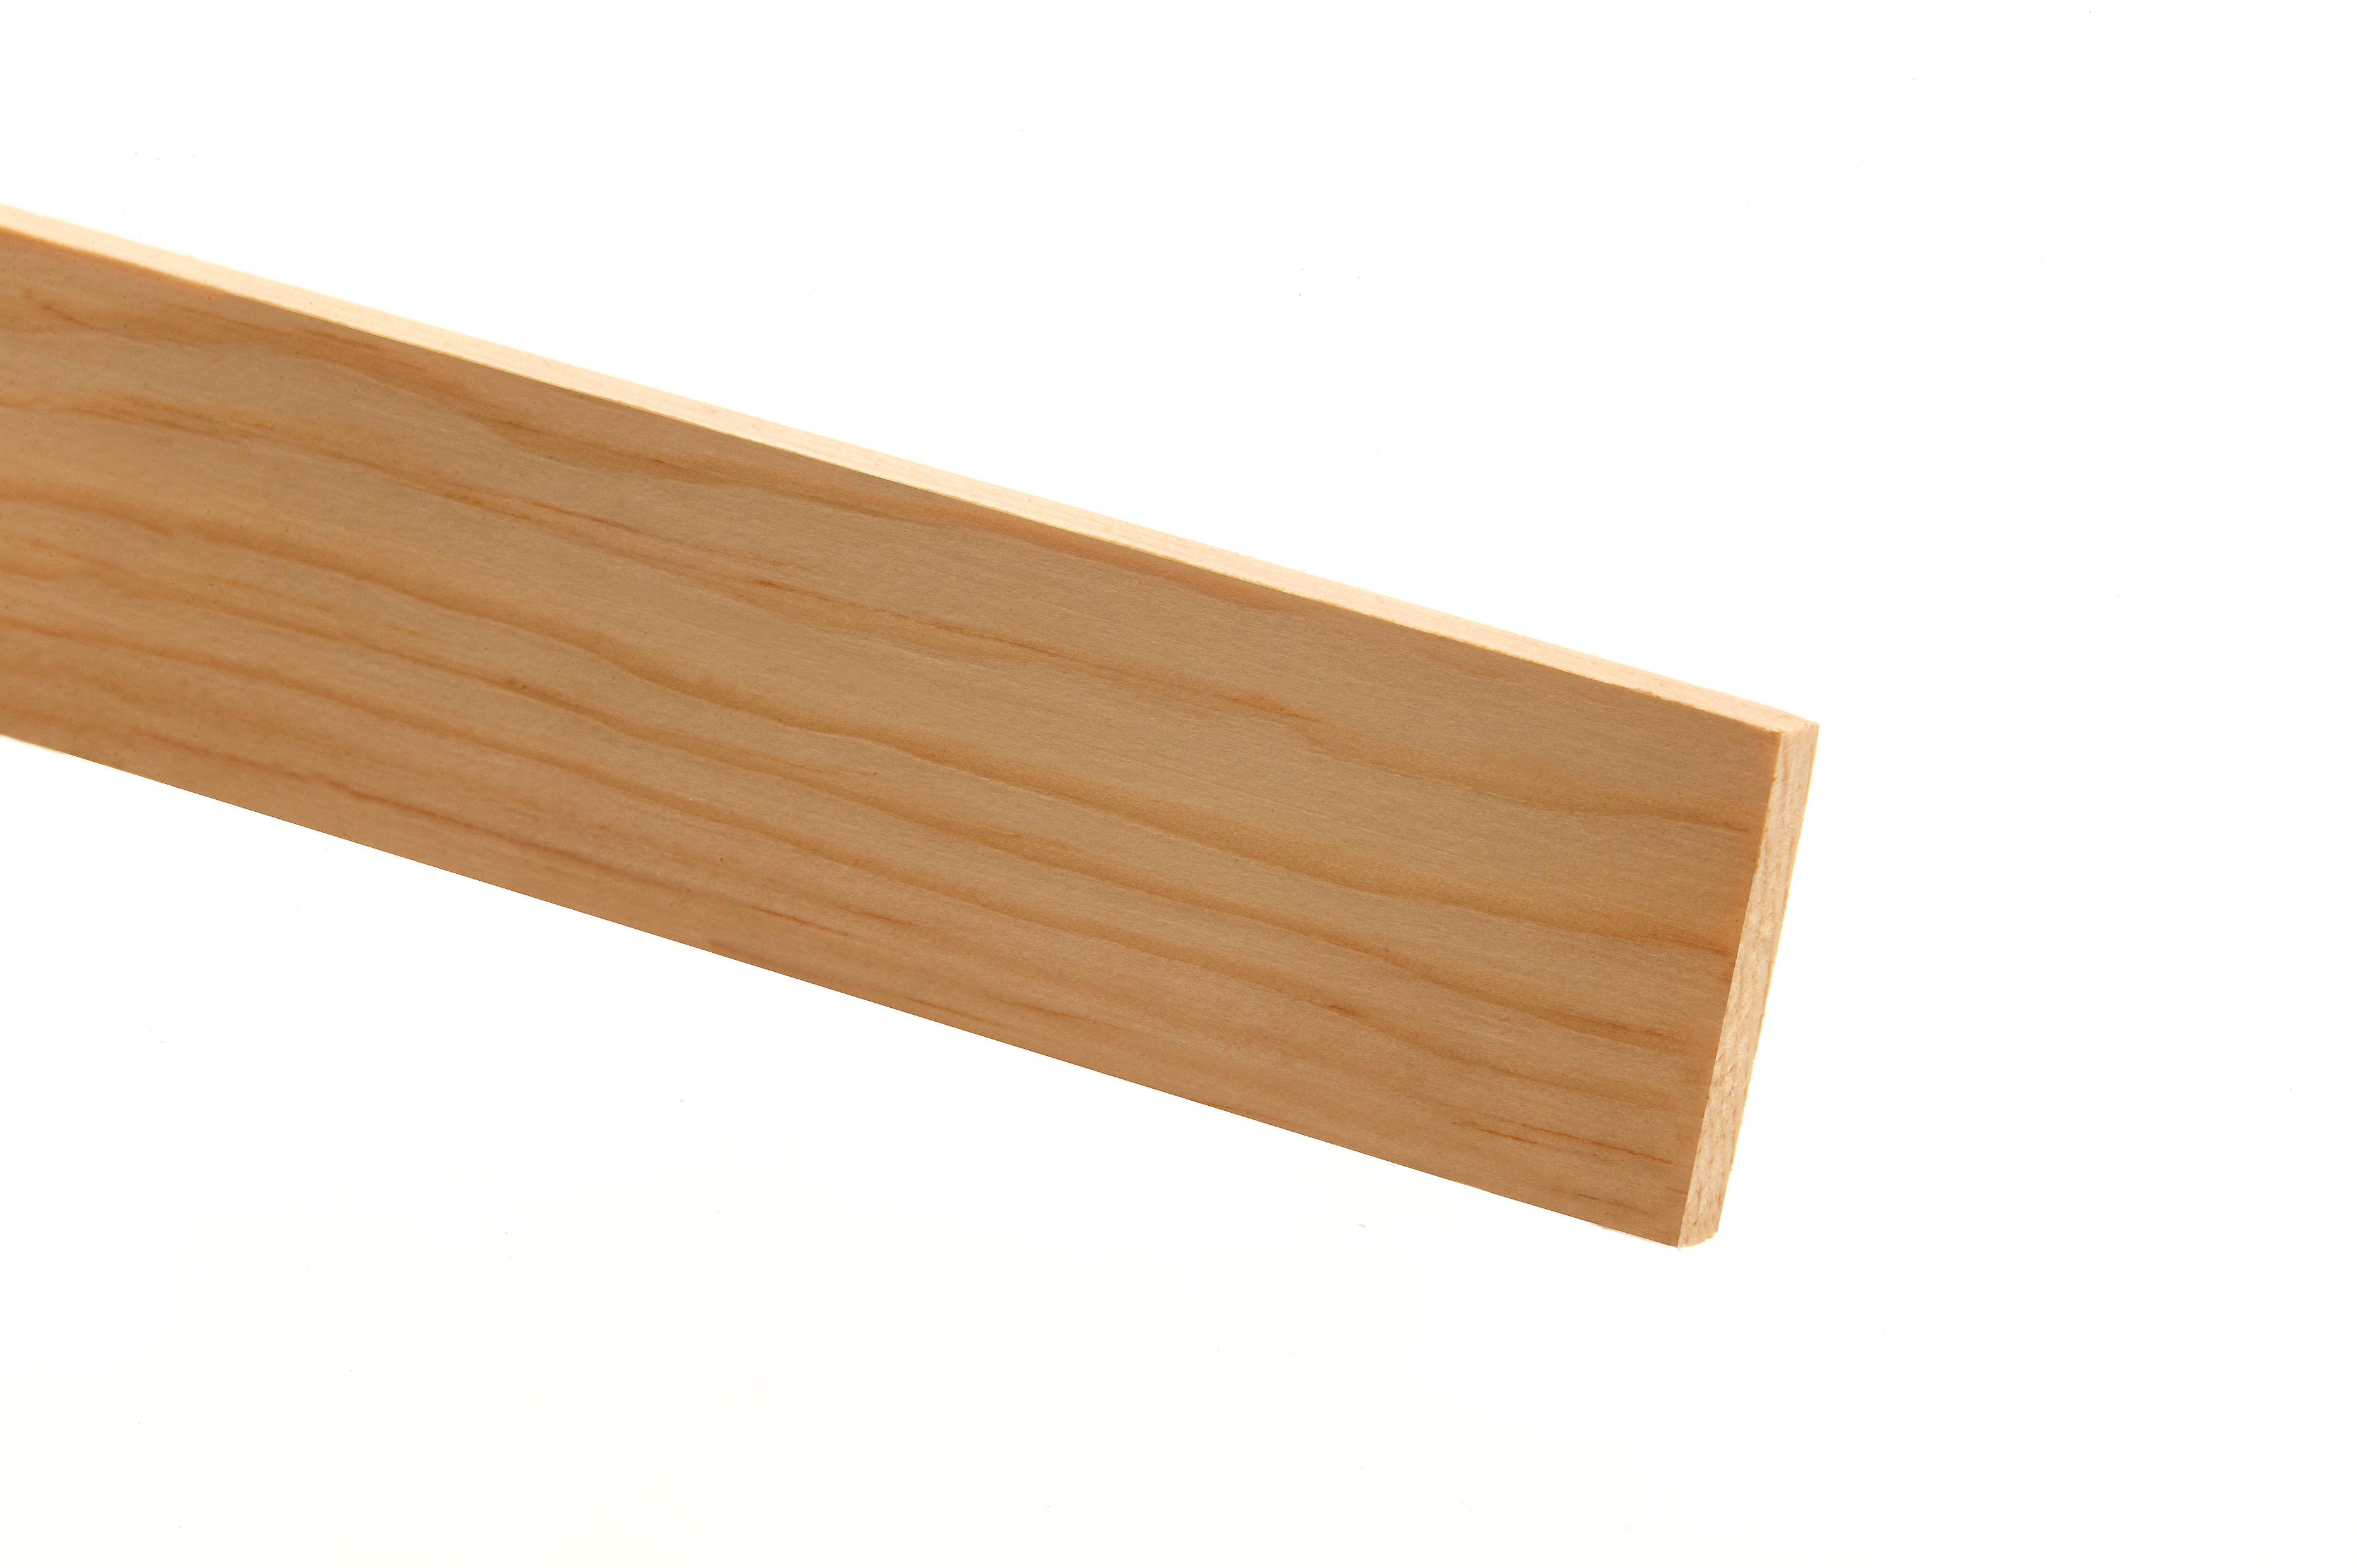 20 Pine PSE Stripwood 4 x 25  x 2400mm